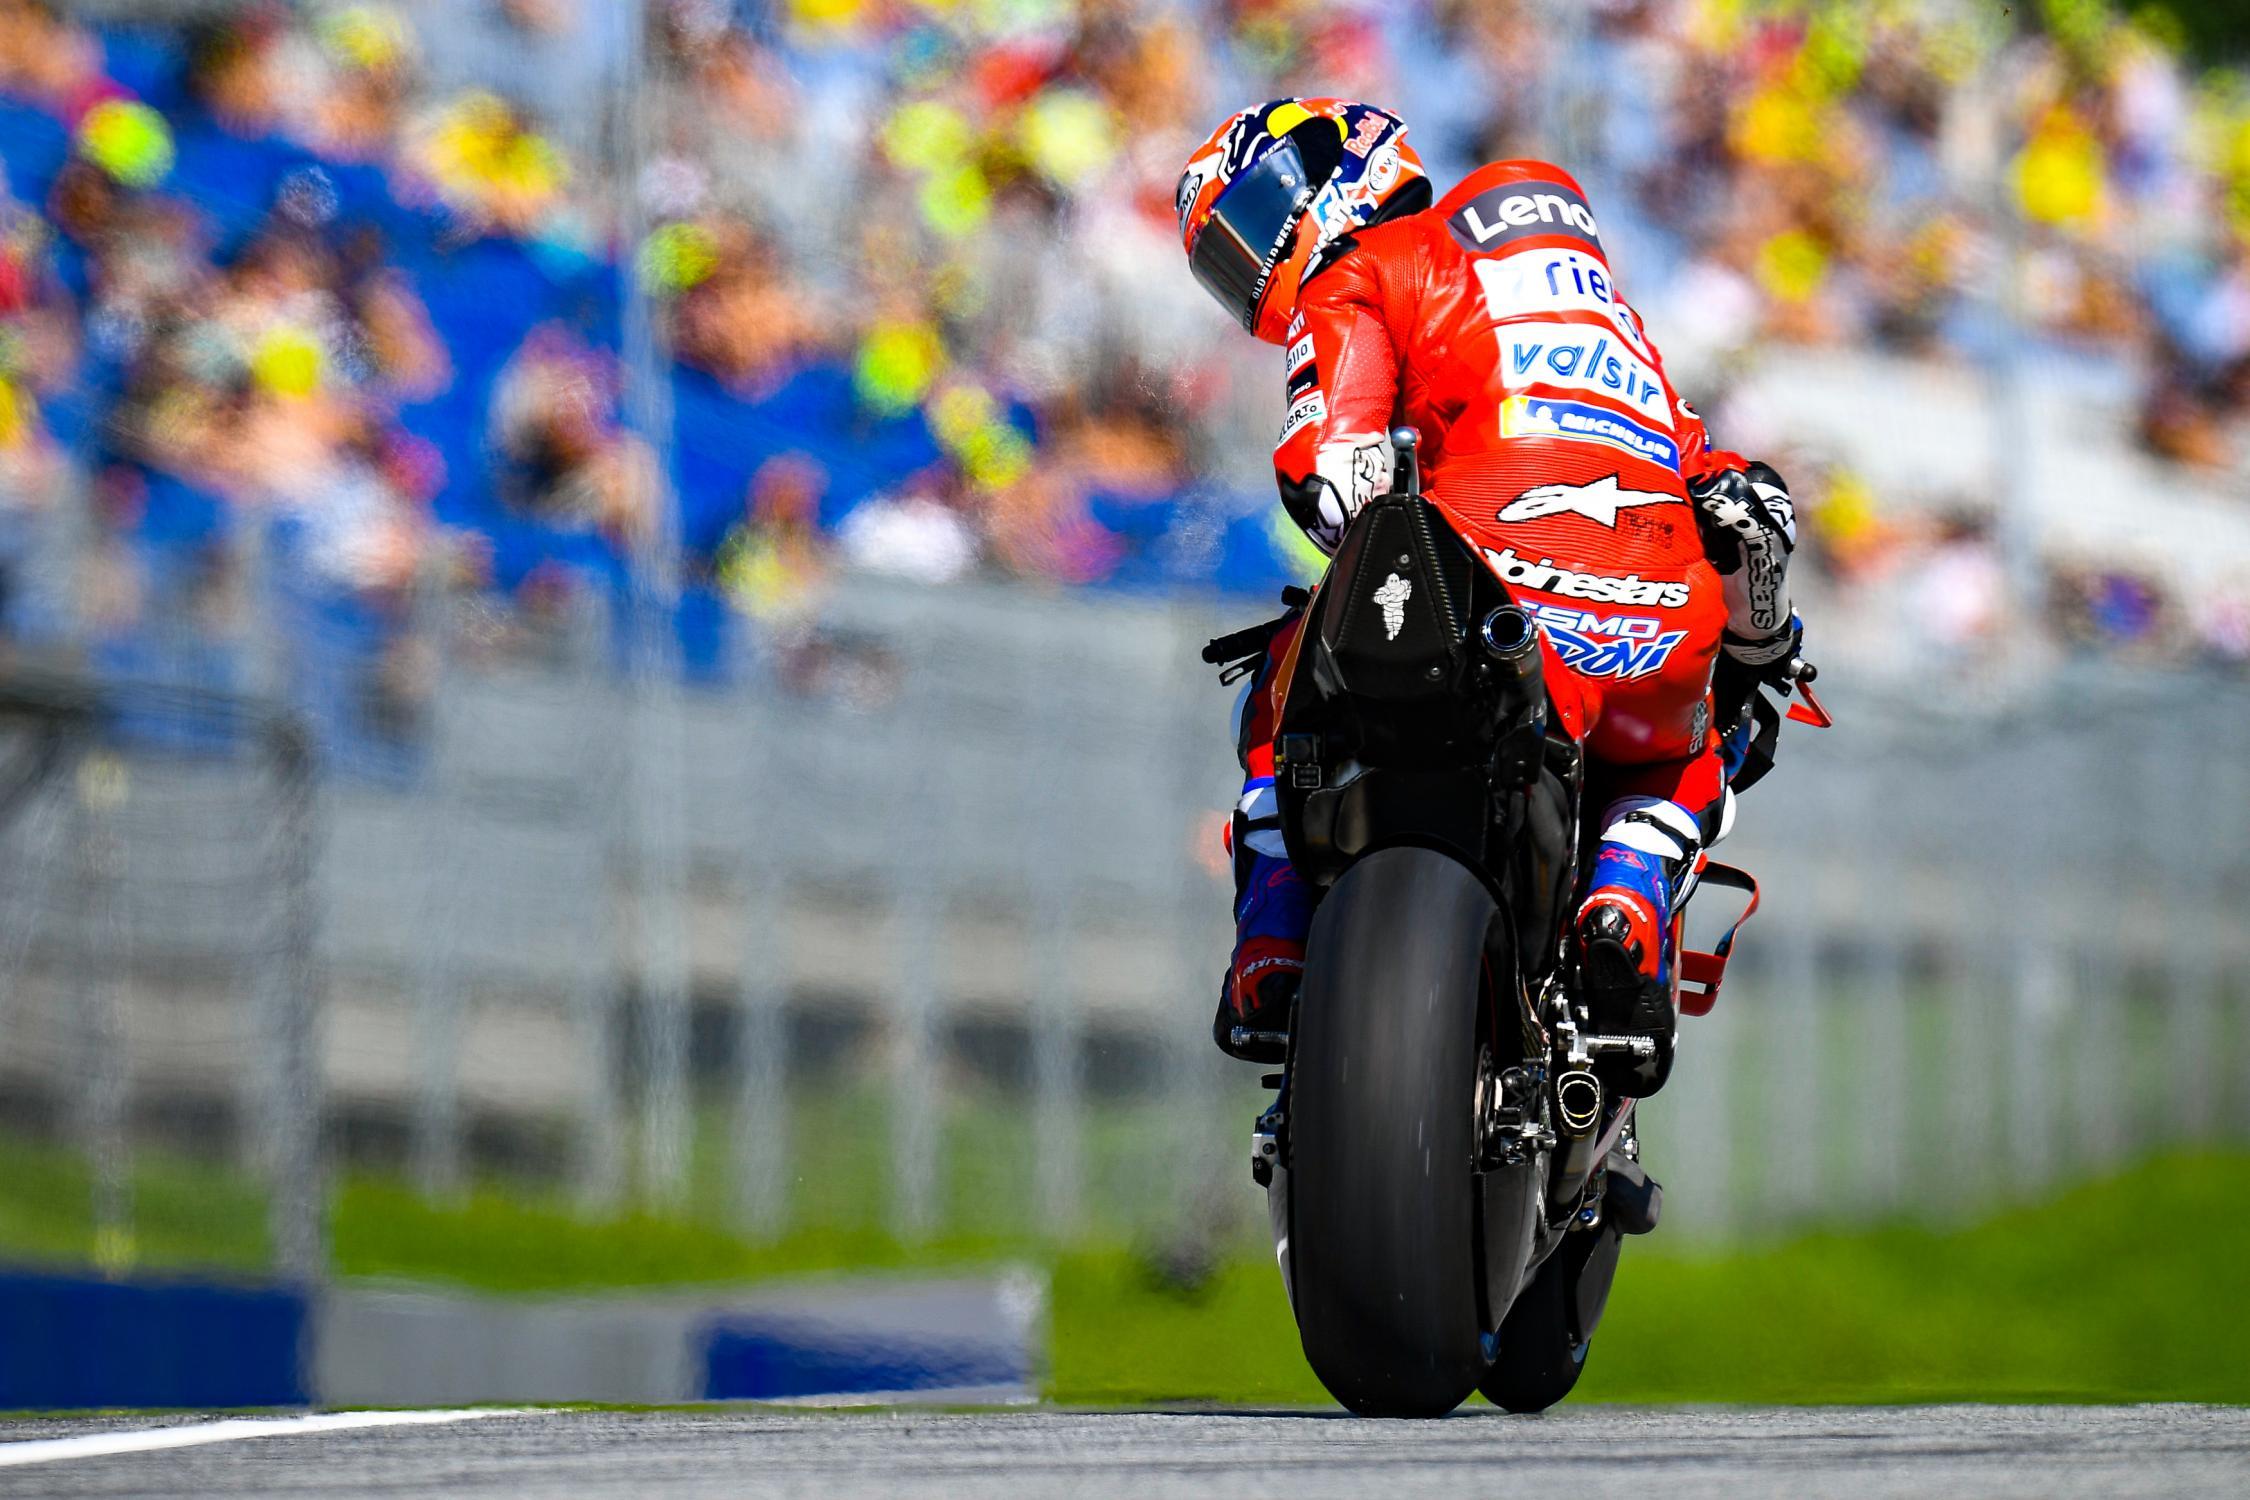 Video Jatuhnya Marc Marquez di Moto GP Thailand 2019